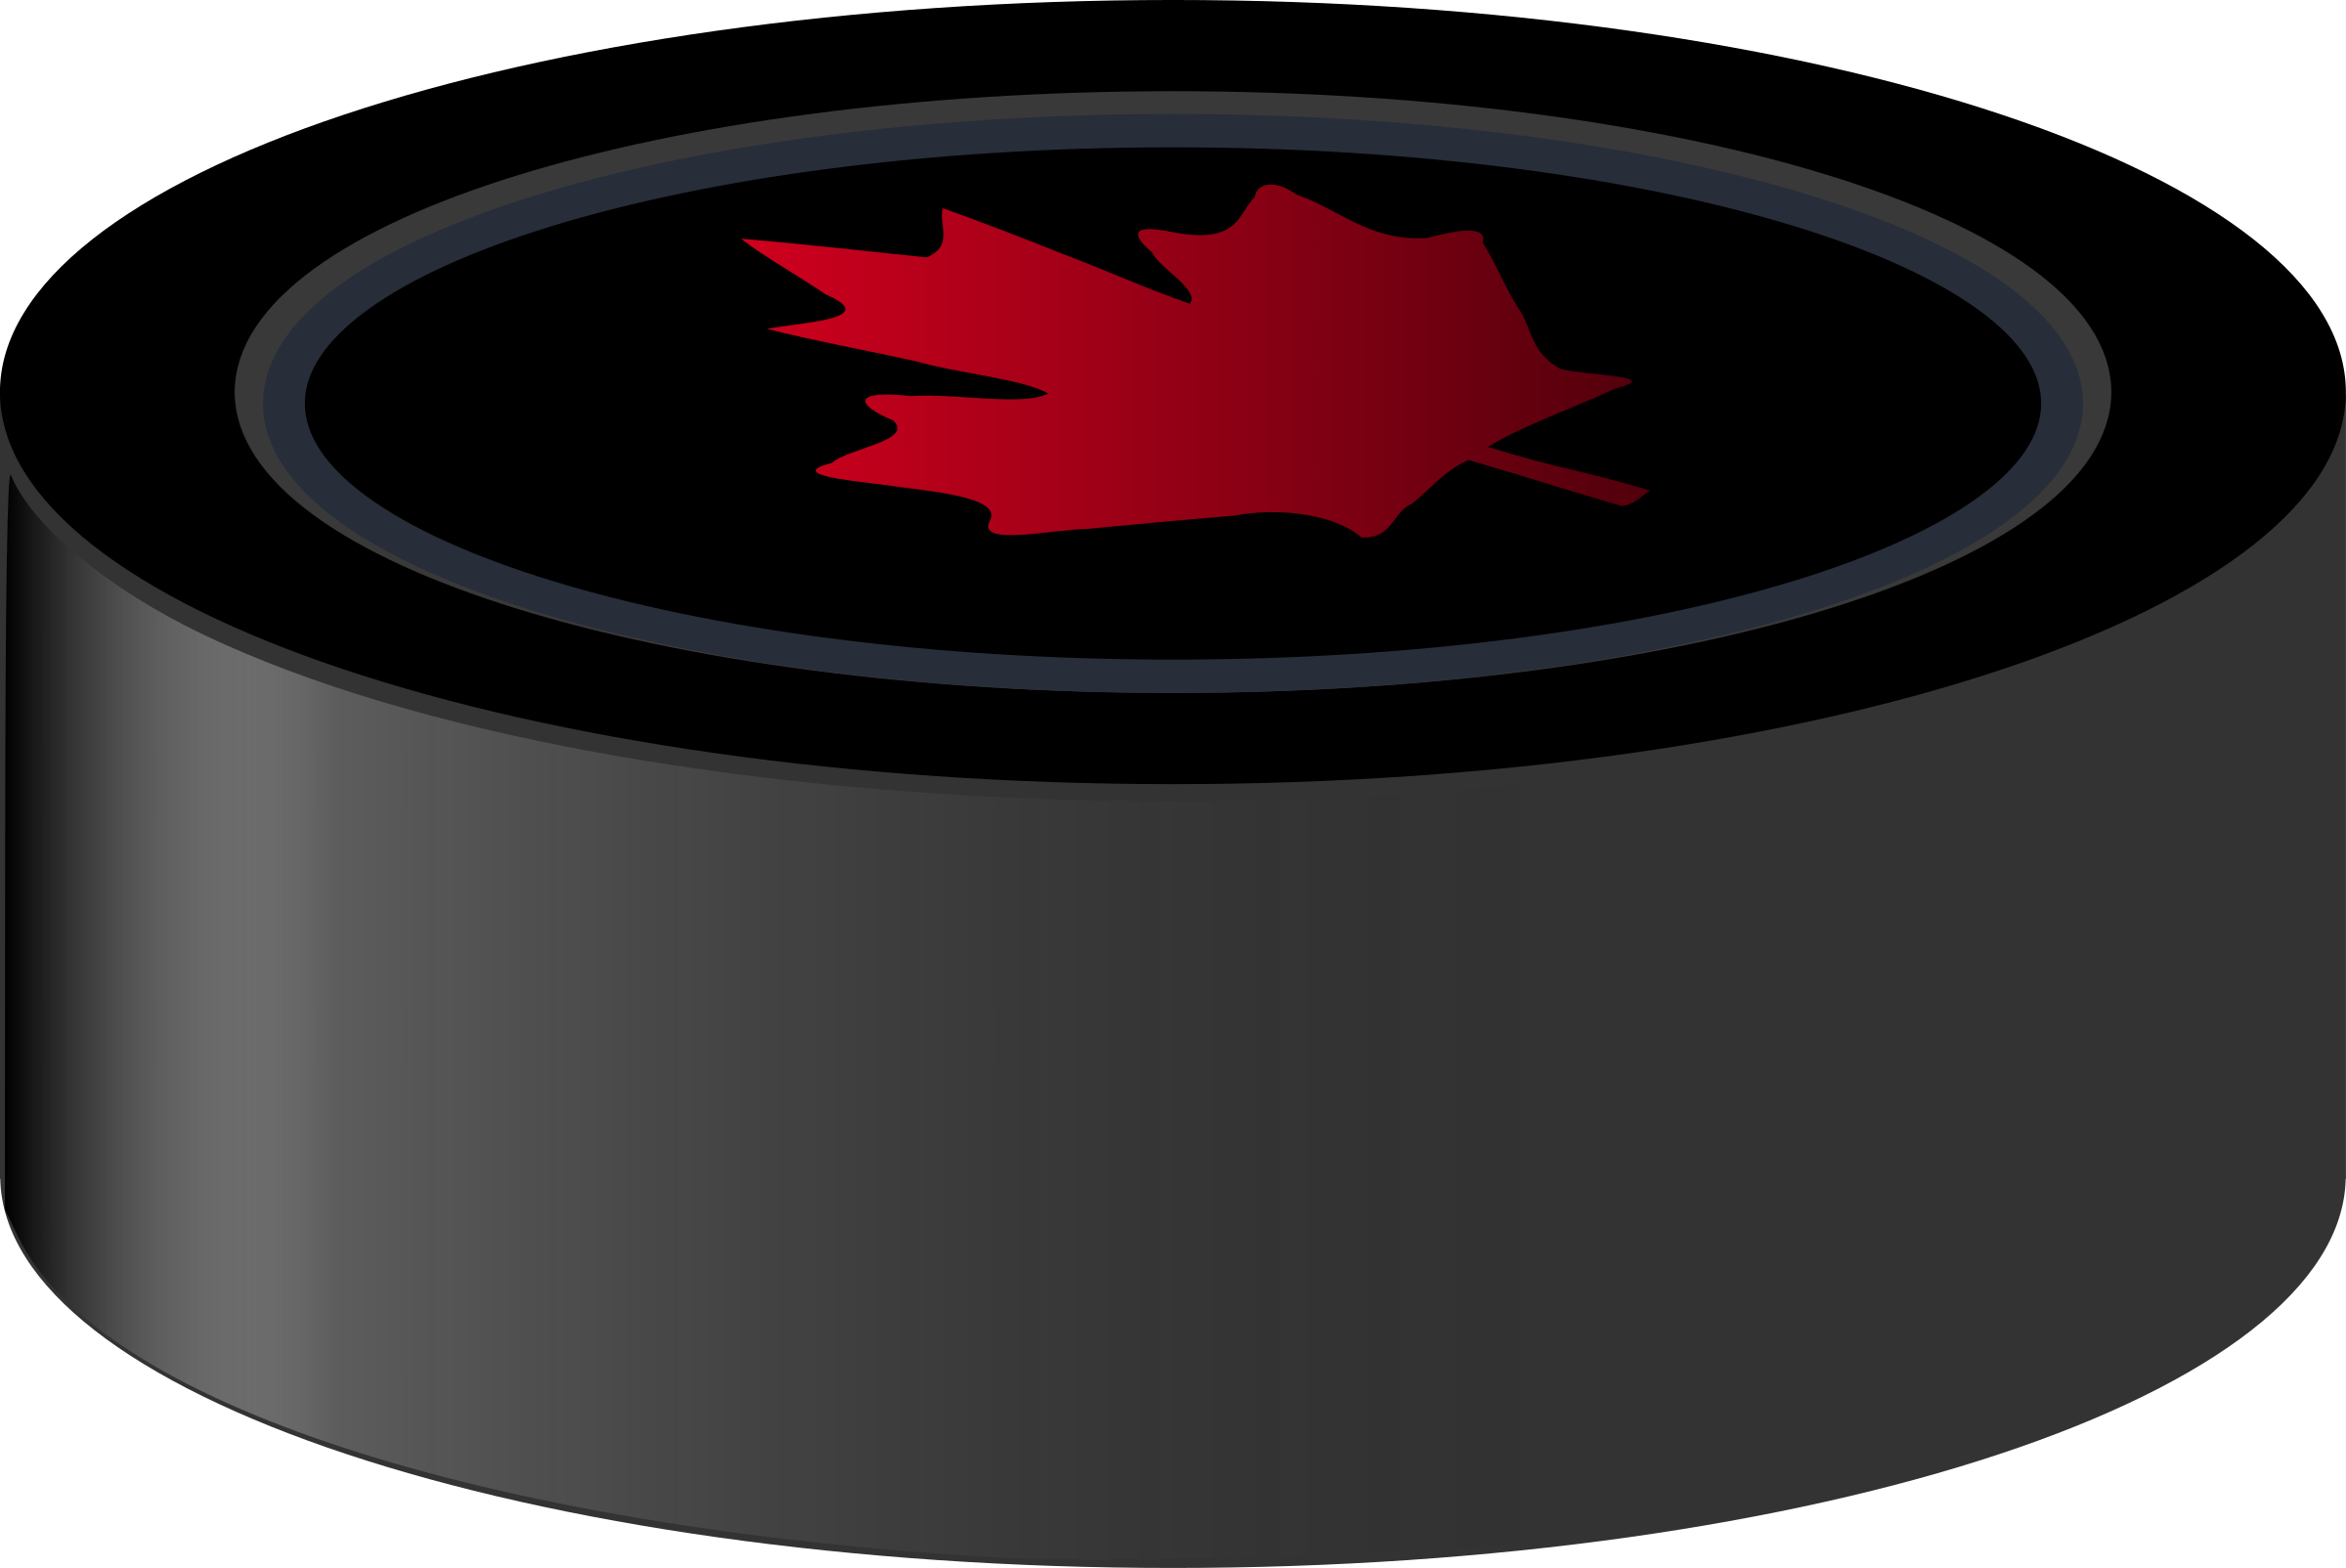 Hockey clipart hockey practice. Puck canada big image